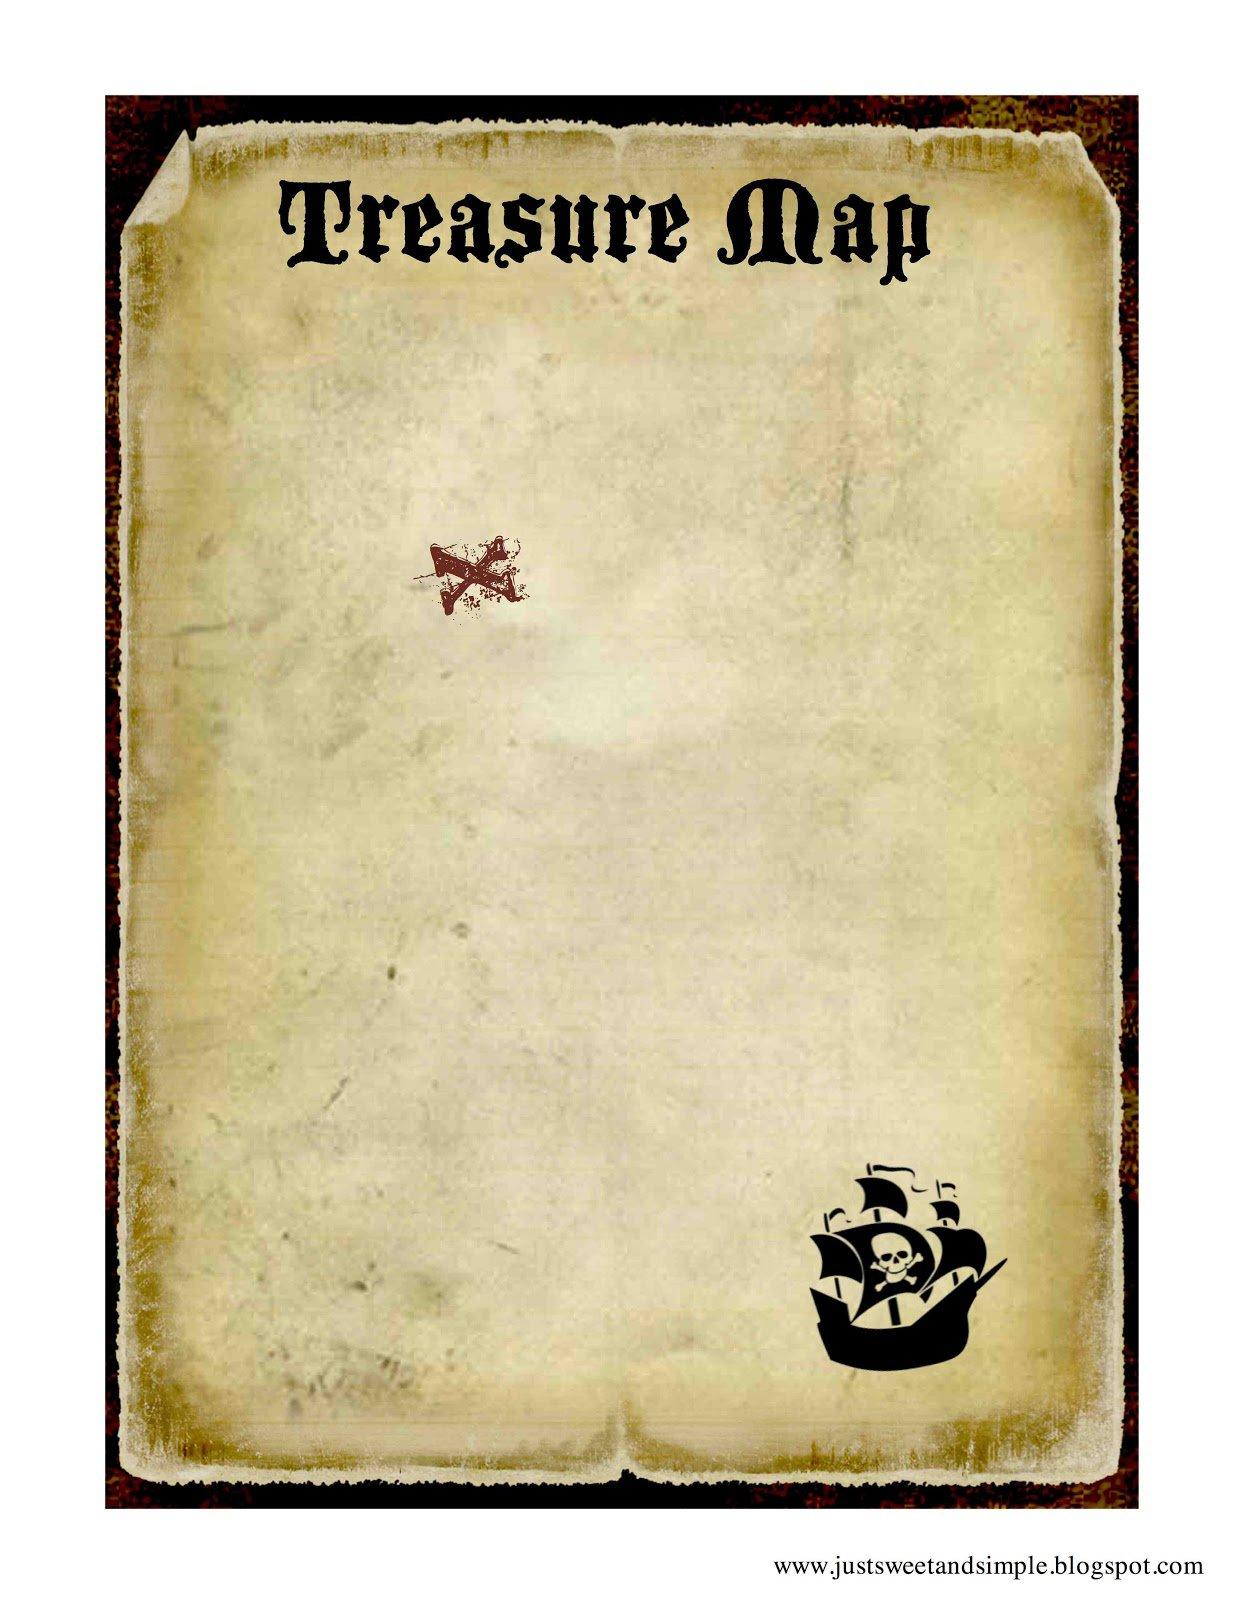 Treasure Hunt Background